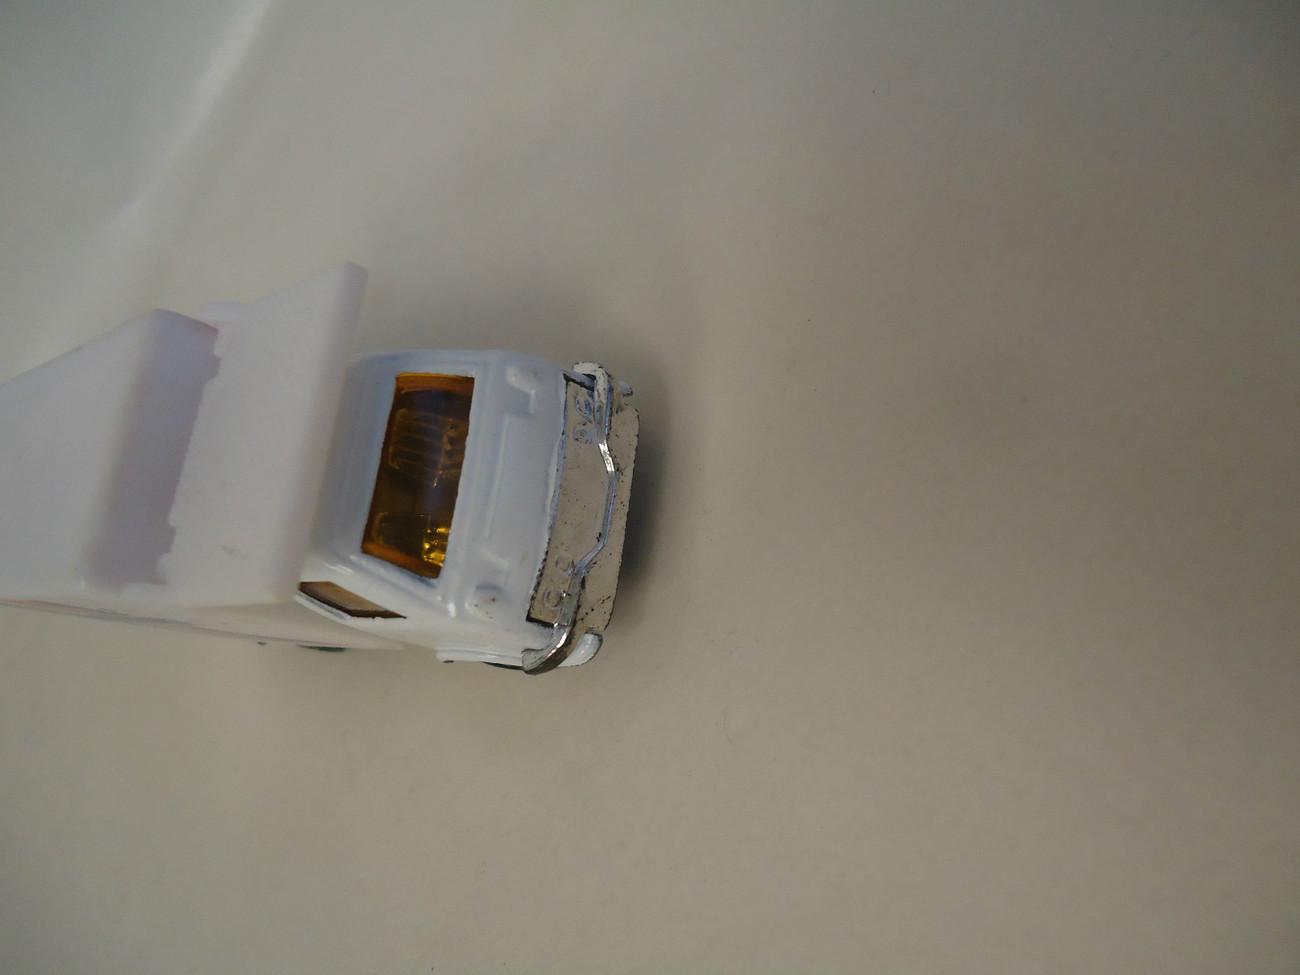 CATERING PLASTIC WHITE  BOX TRUCK-1:64 SCALE -